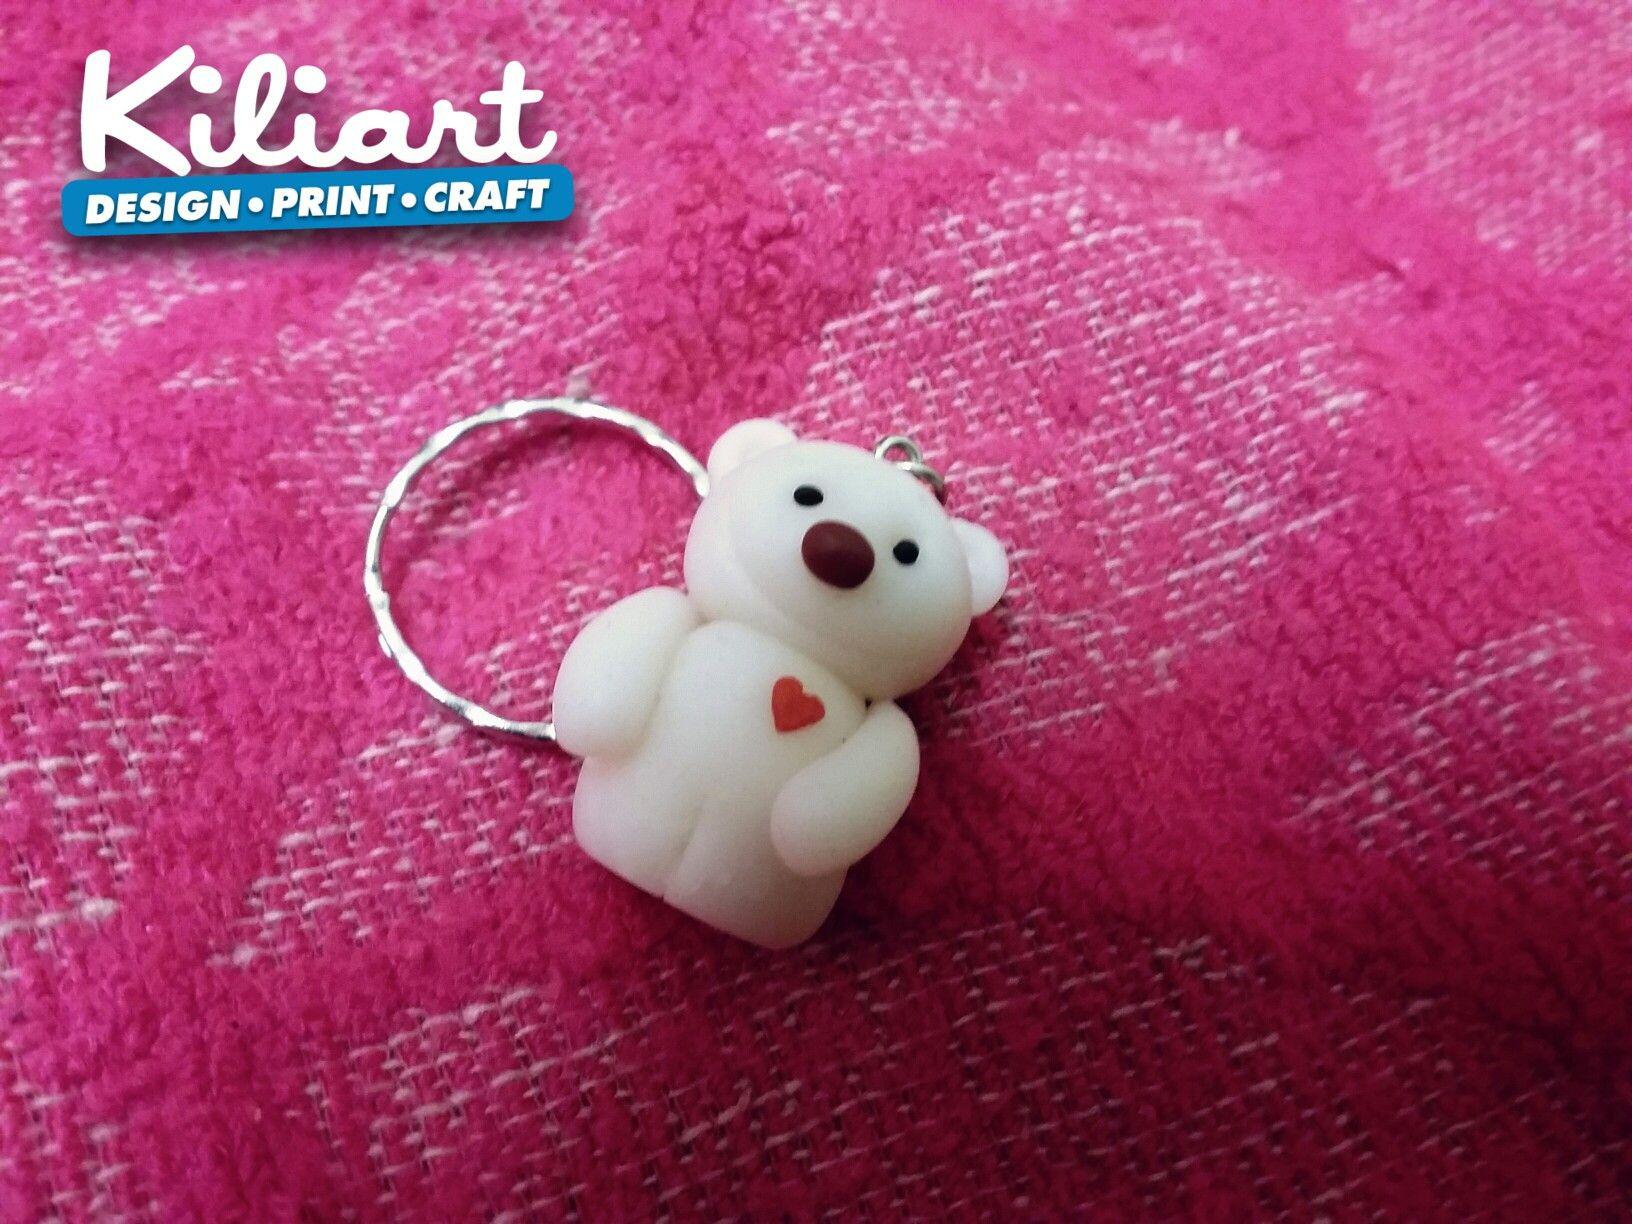 Handmade polymer clay teddy bear keychain..